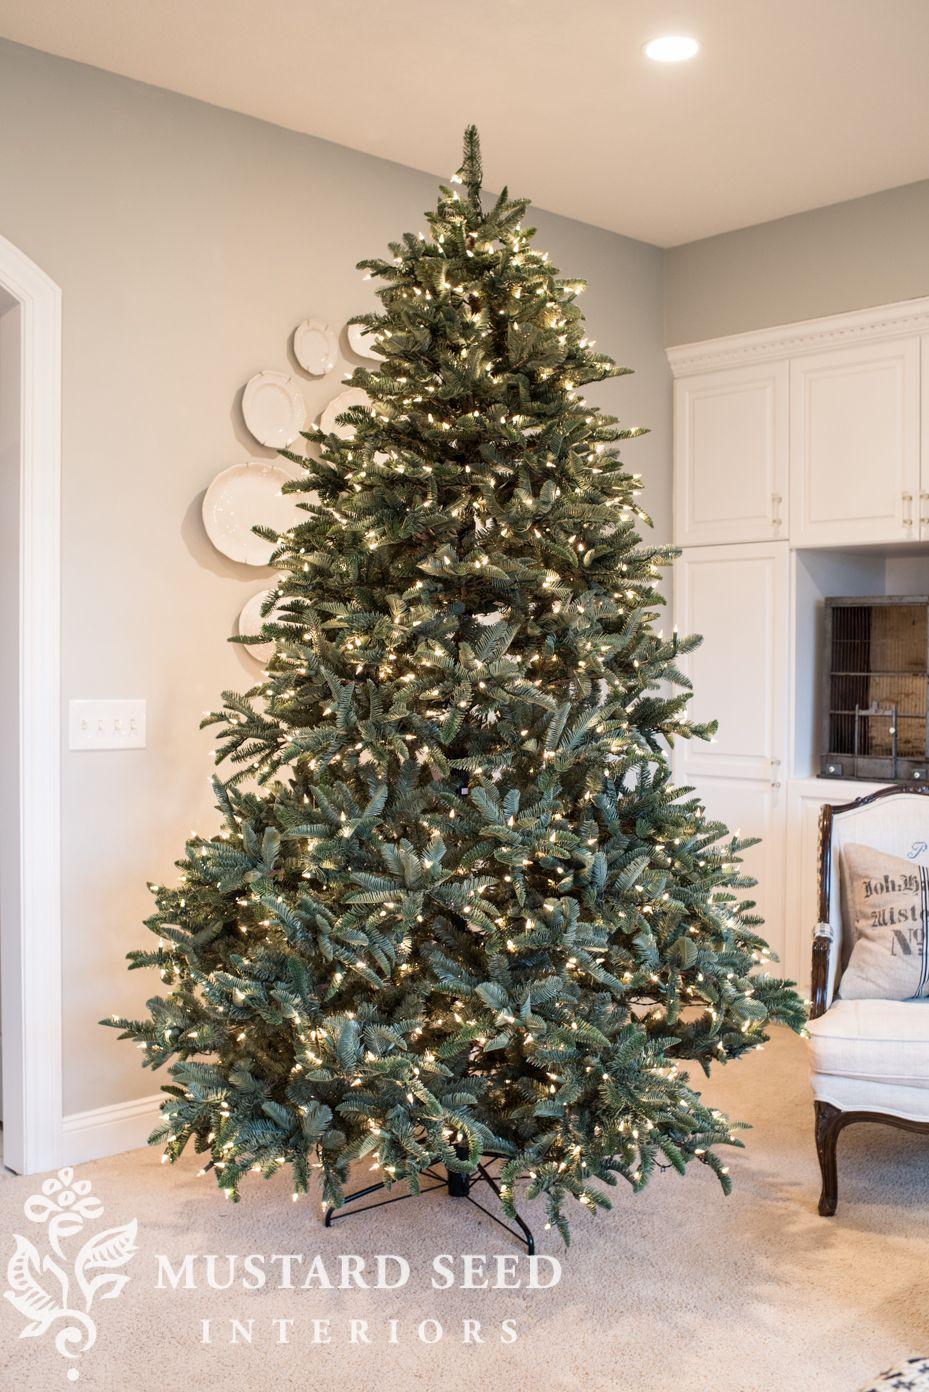 Dining Room Christmas Tree 2018 Miss Mustard Seed Balsam Hill Christmas Tree Christmas Tree Christmas Tree Decorations Diy